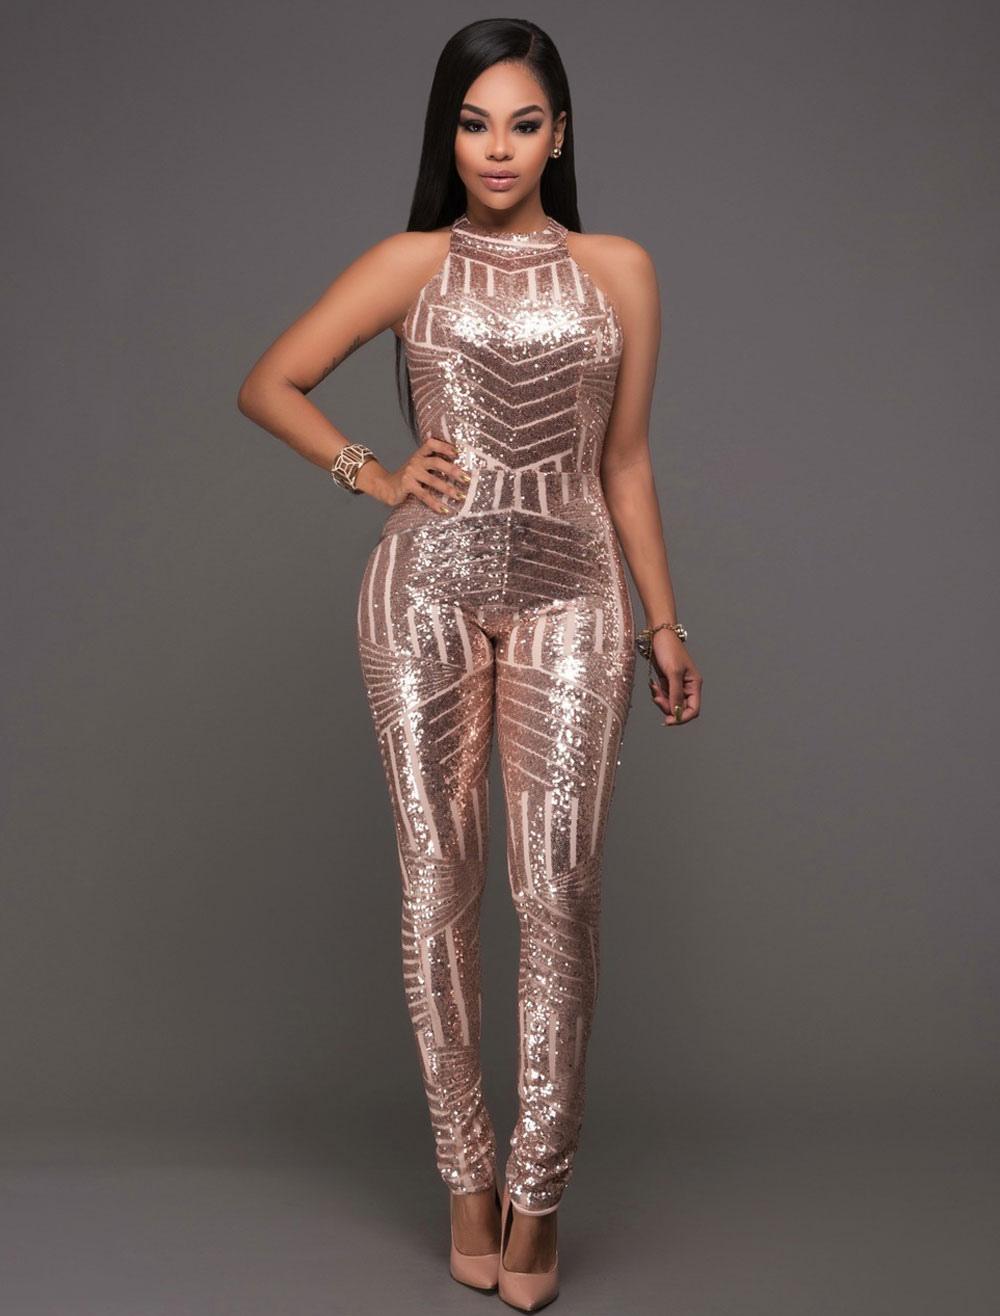 Women Sequin Jumpsuit Champagne Backless Long Skinny Leg Partywear